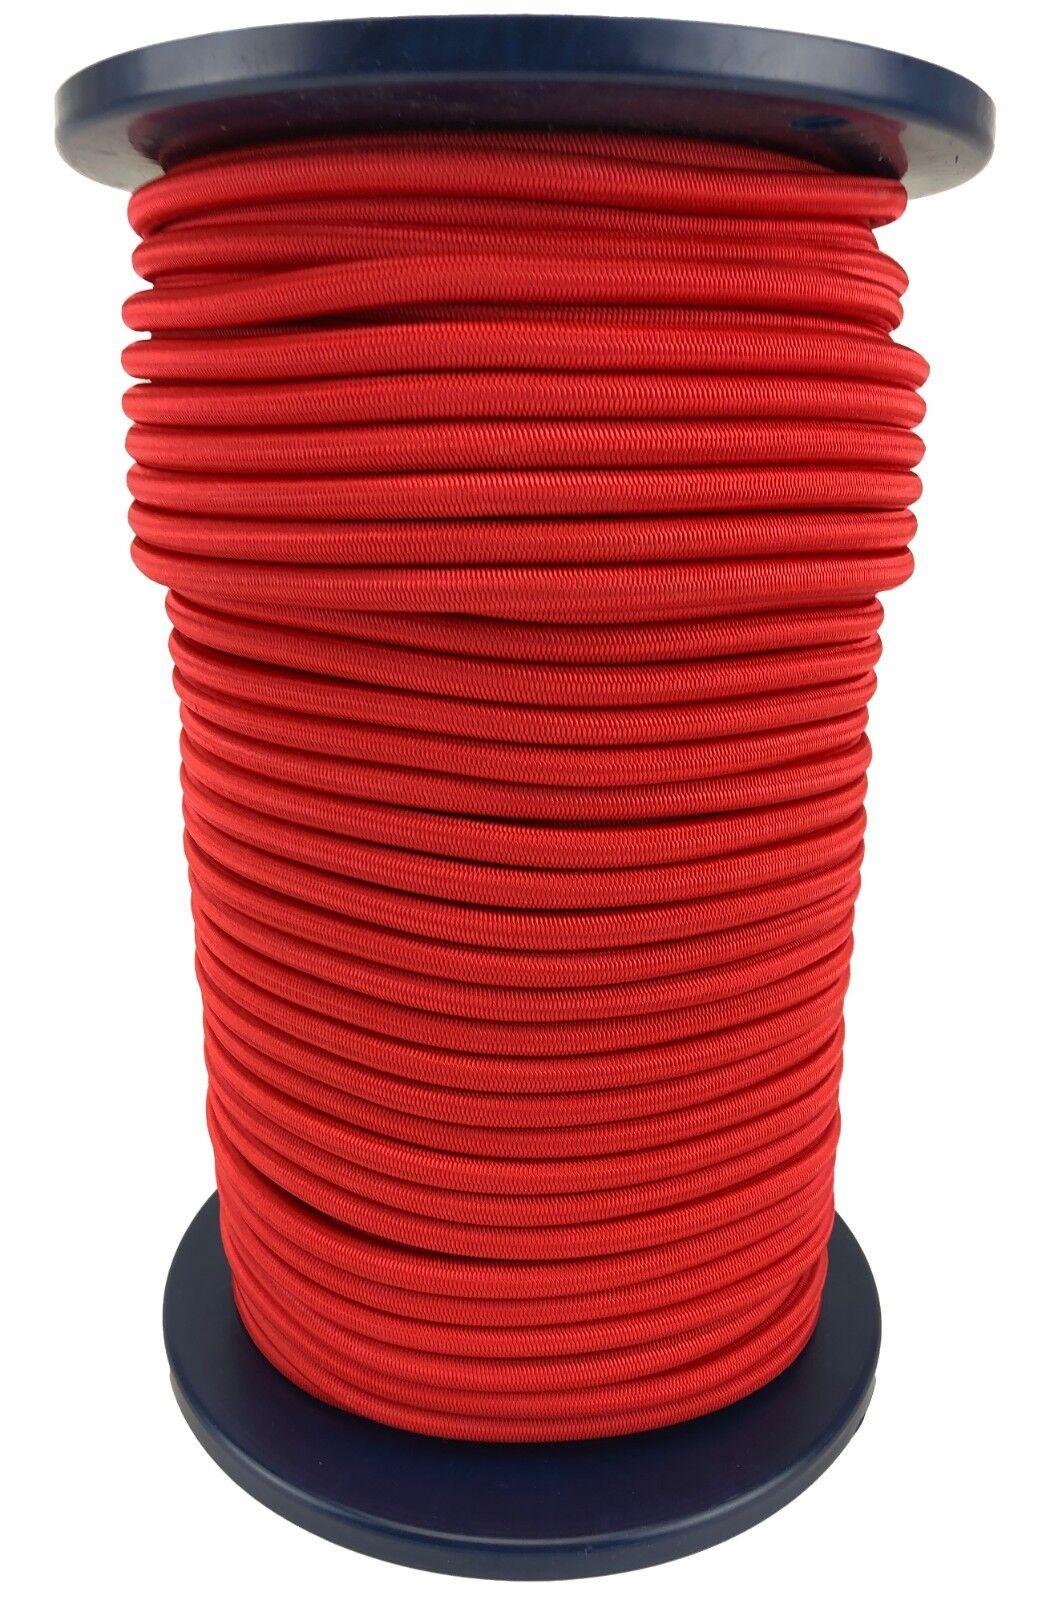 12mm Rot Elastischer Gummizug Seil X 50 50 50 Meter Krawatte Unten 4ba477